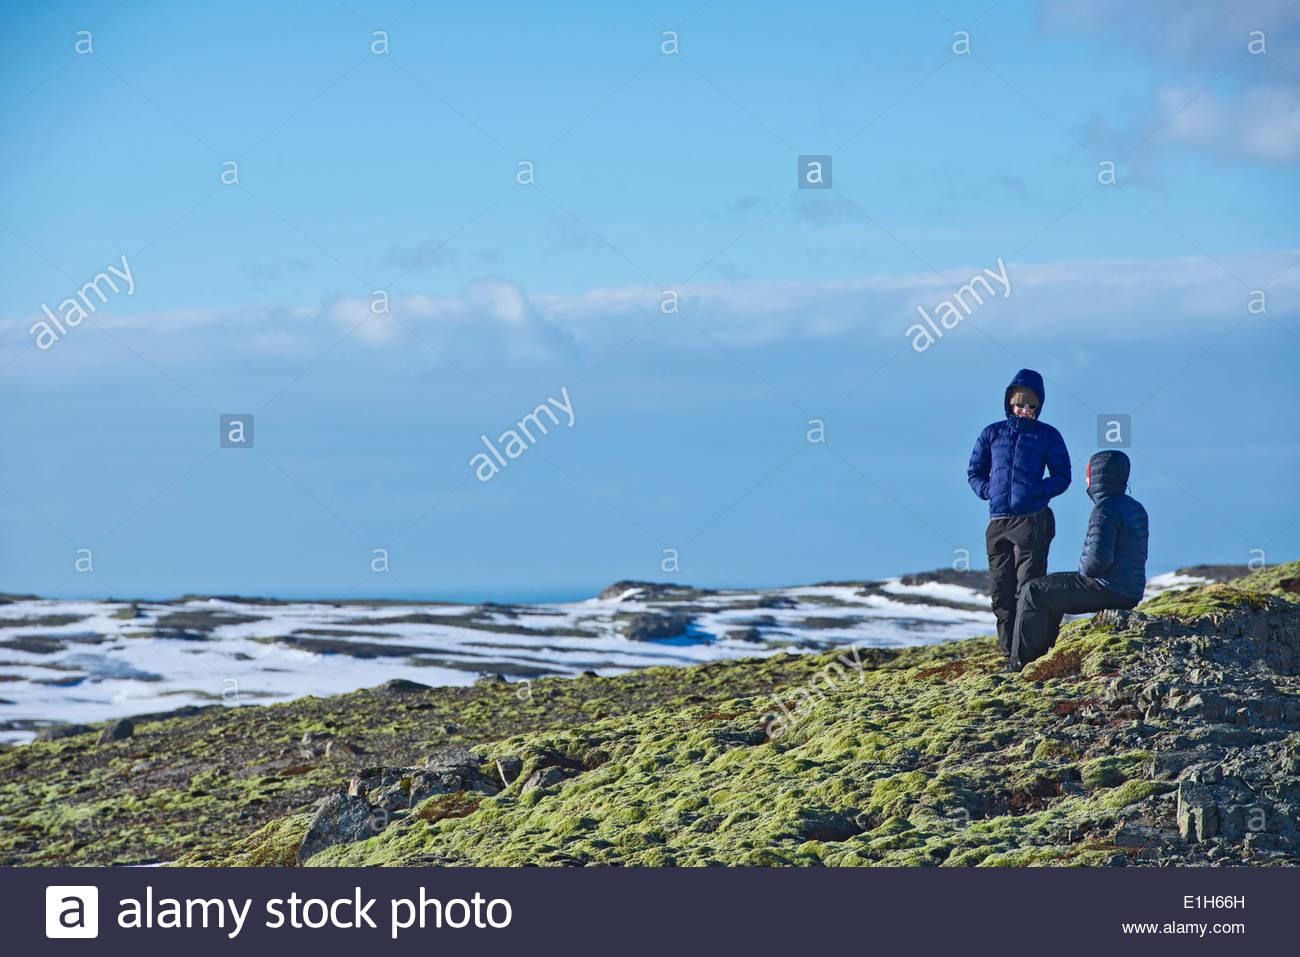 Young hiking couple taking a break at Breidamerkurjokull, Vatnajokull National Park, Iceland - Stock Image